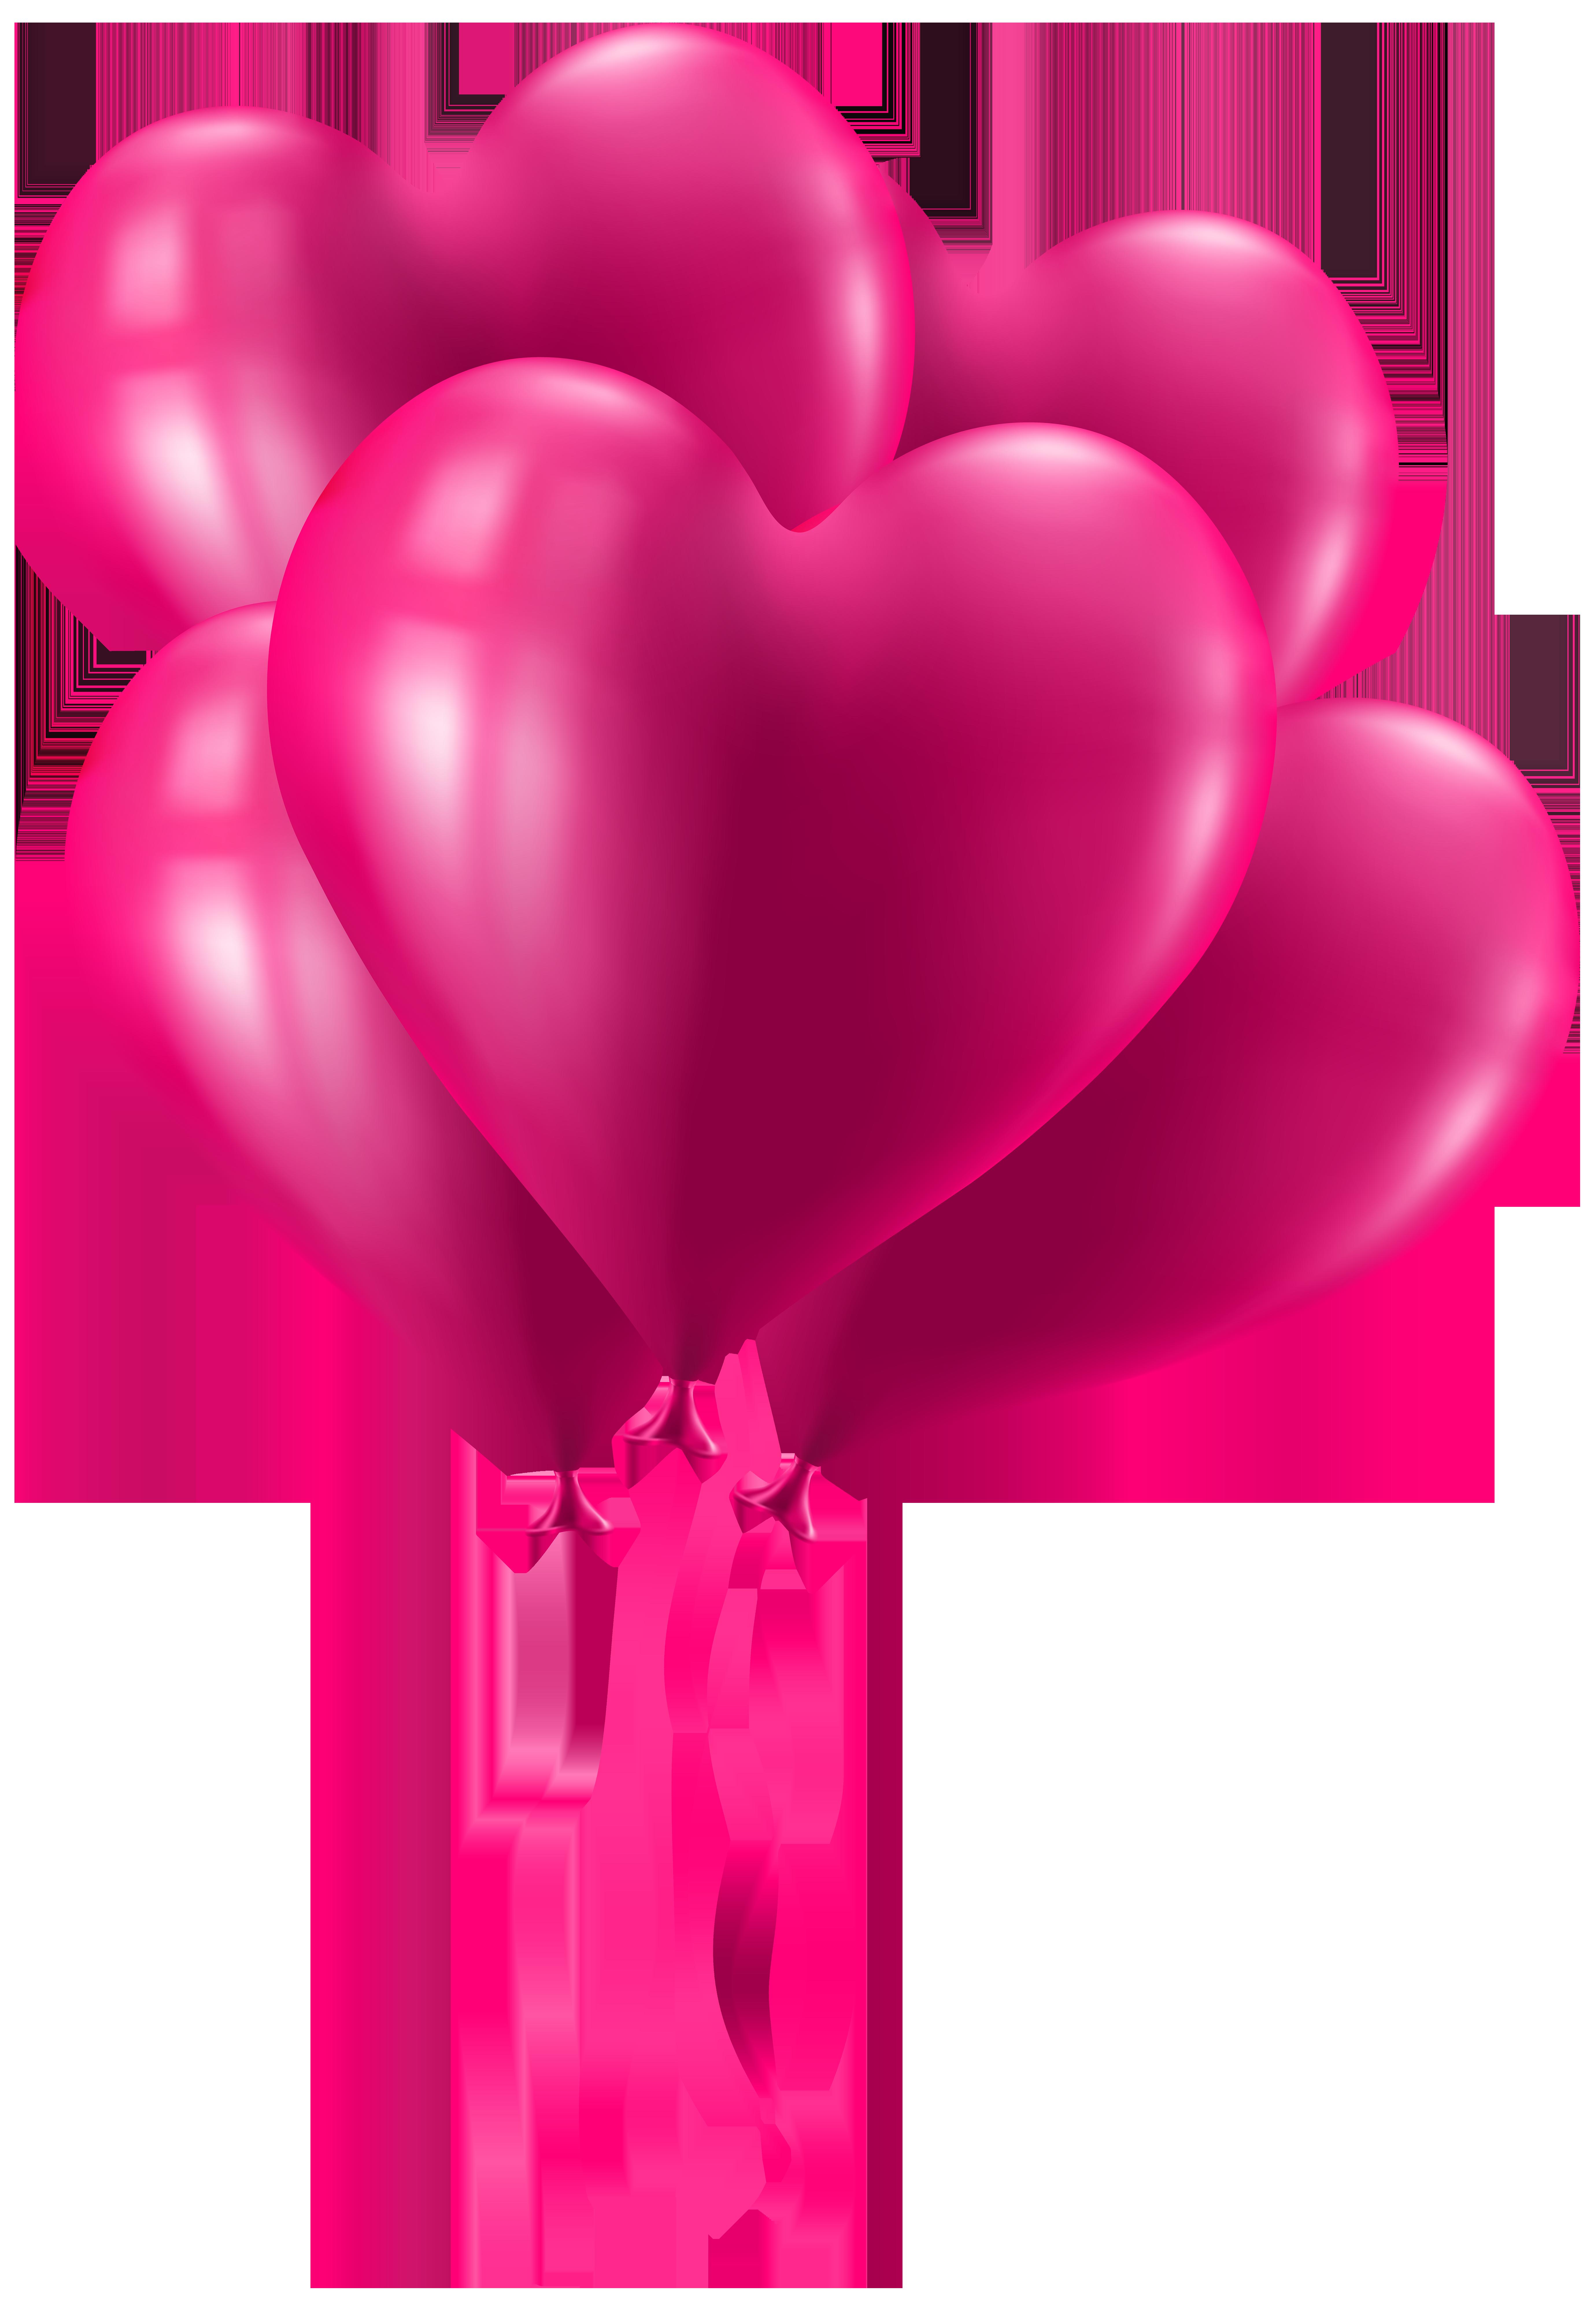 5521x8000 Valentine's Day Pink Heart Balloons Clip Art Imageu200b Gallery